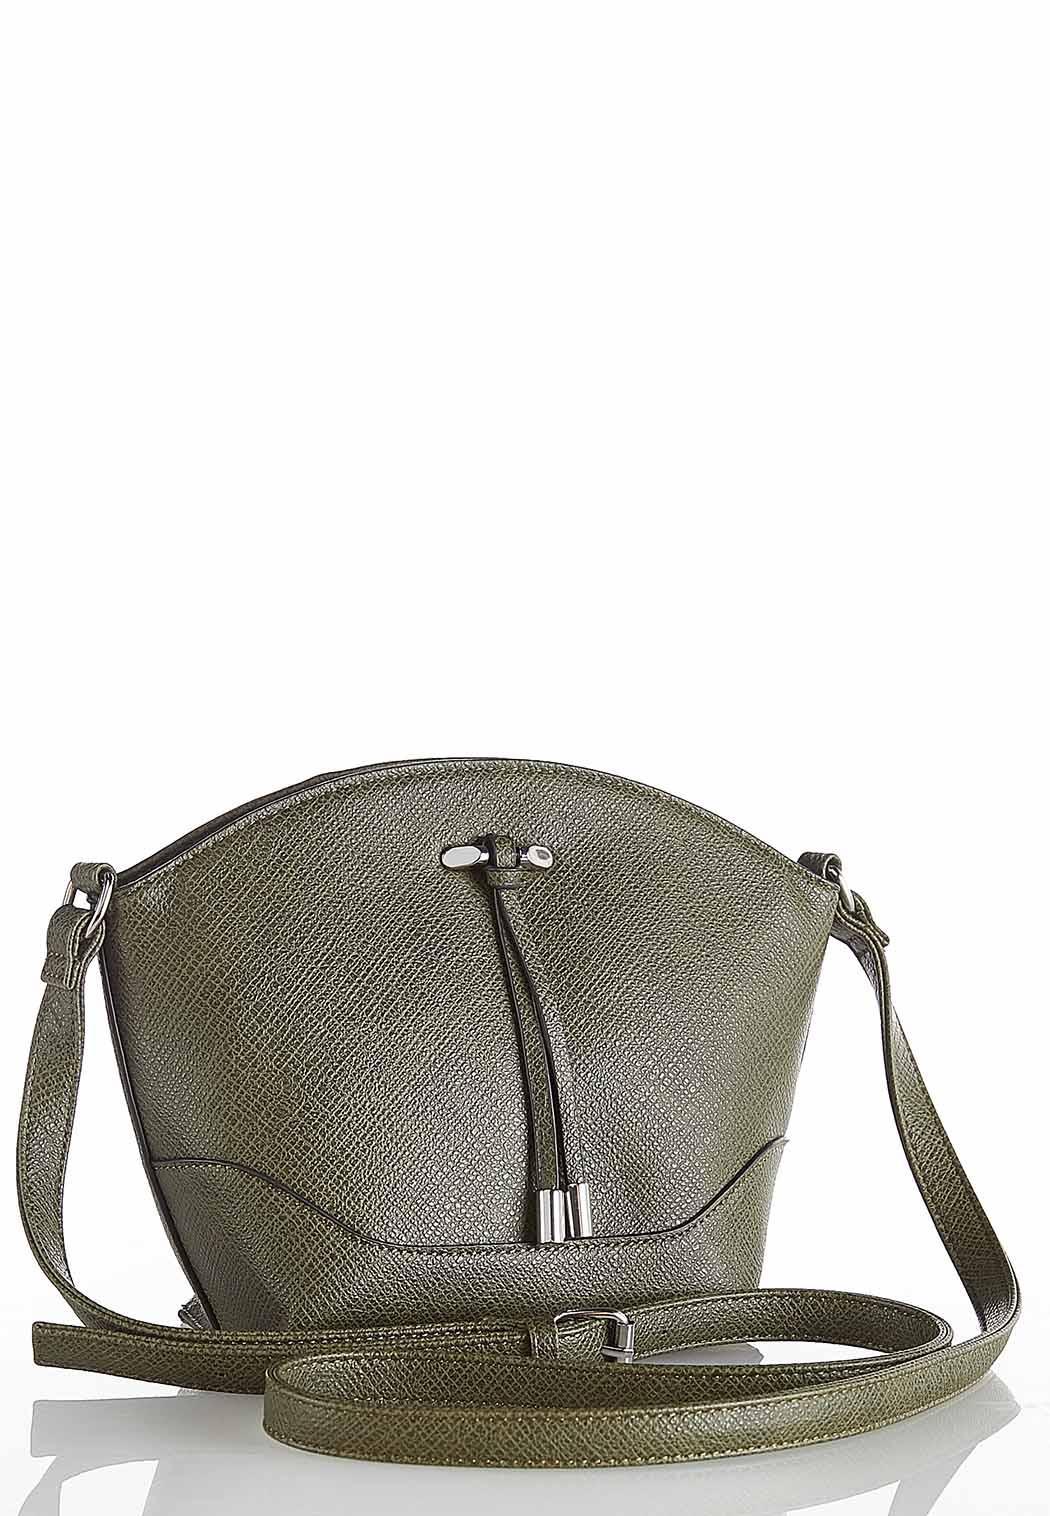 Hardware Tassel Bucket Crossbody